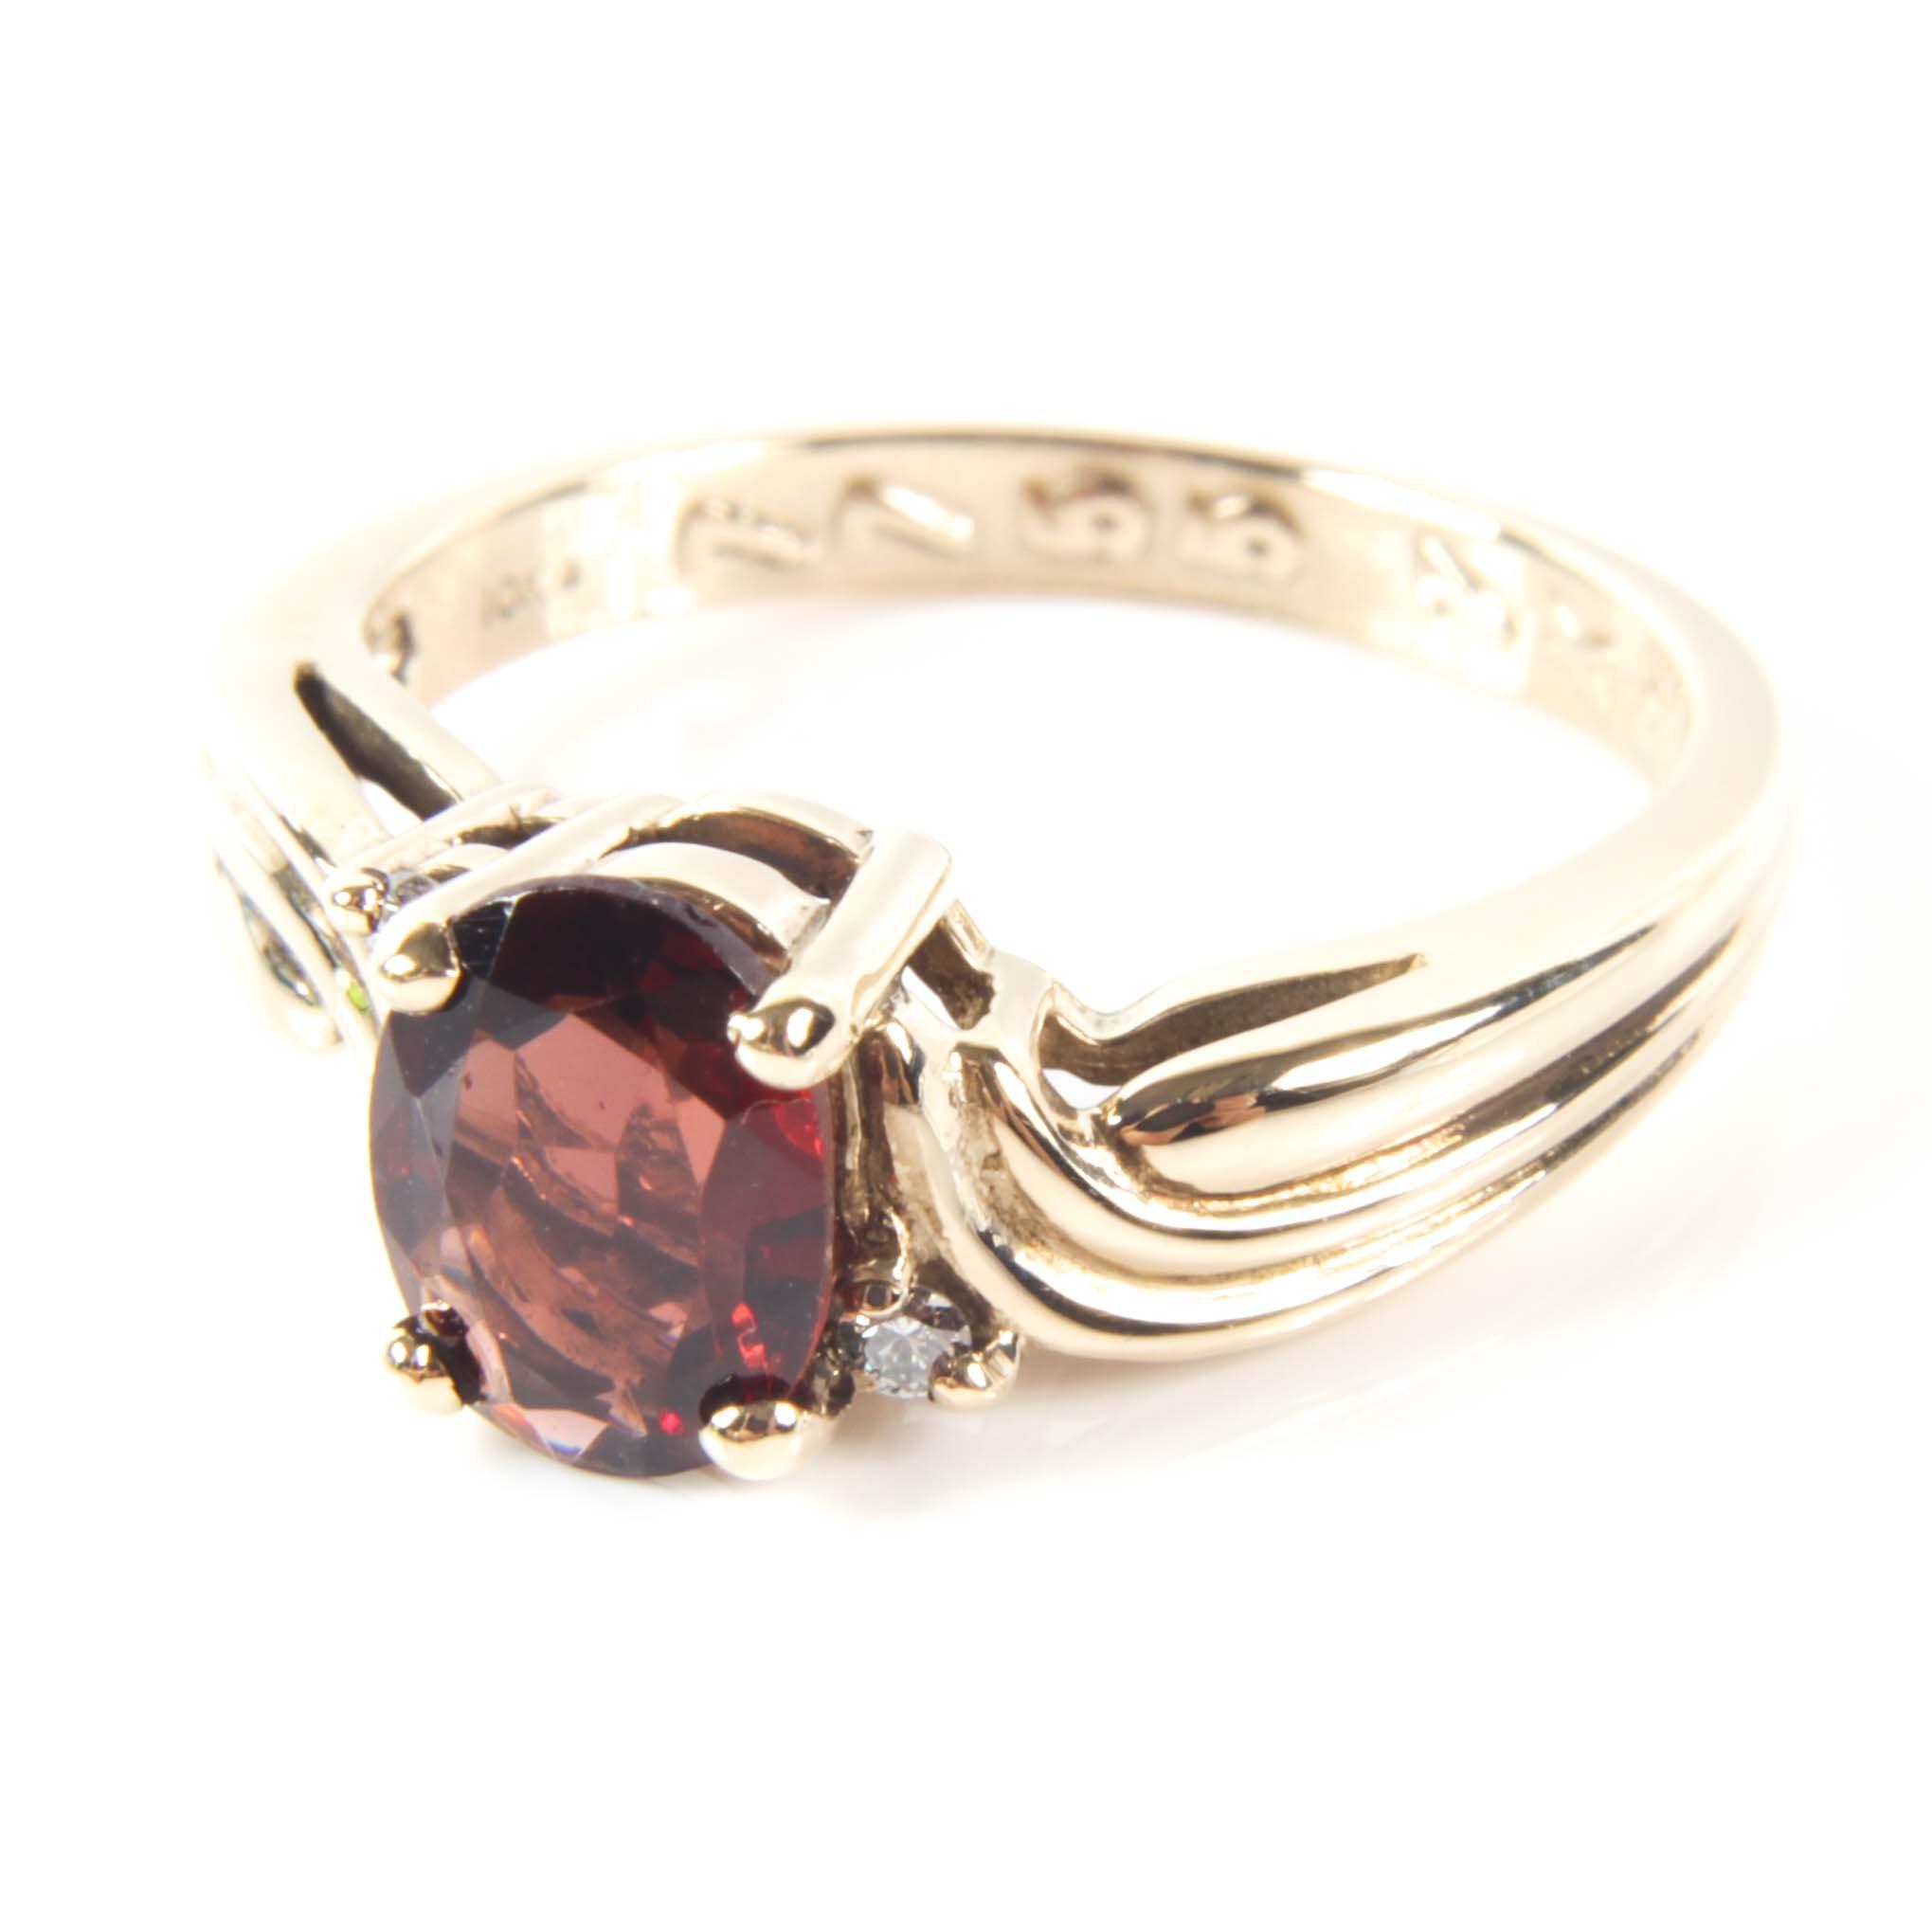 10K Yellow Gold 1.40 CT Garnet and Diamond Ring